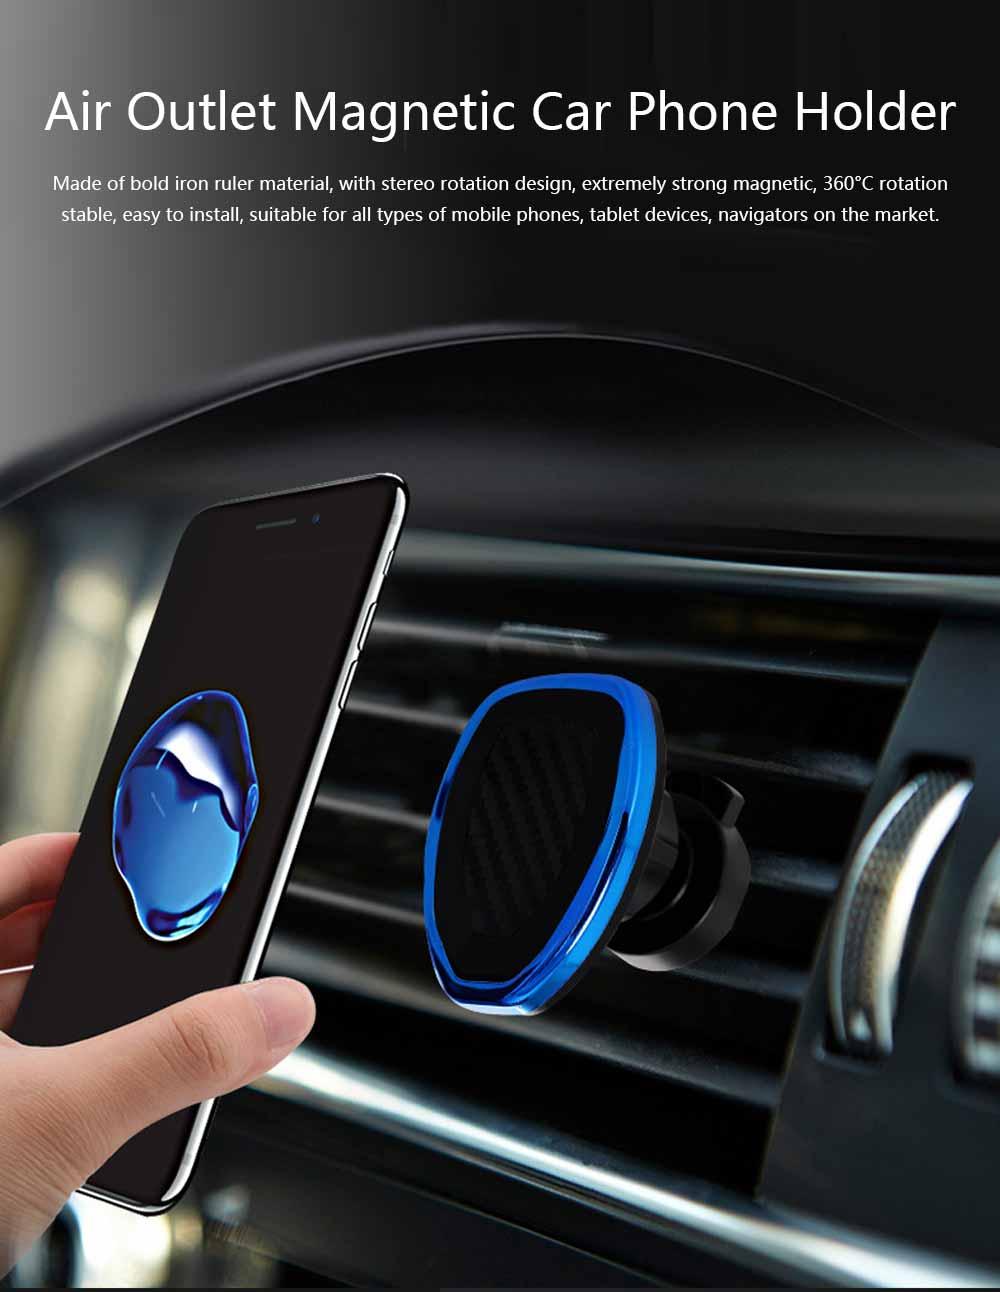 Air Outlet Magnetic Car Phone Holder, Car Lazy Bracket Car Phone Holder, Practical Magnetic Car Phone Holder for Air Outlet 0